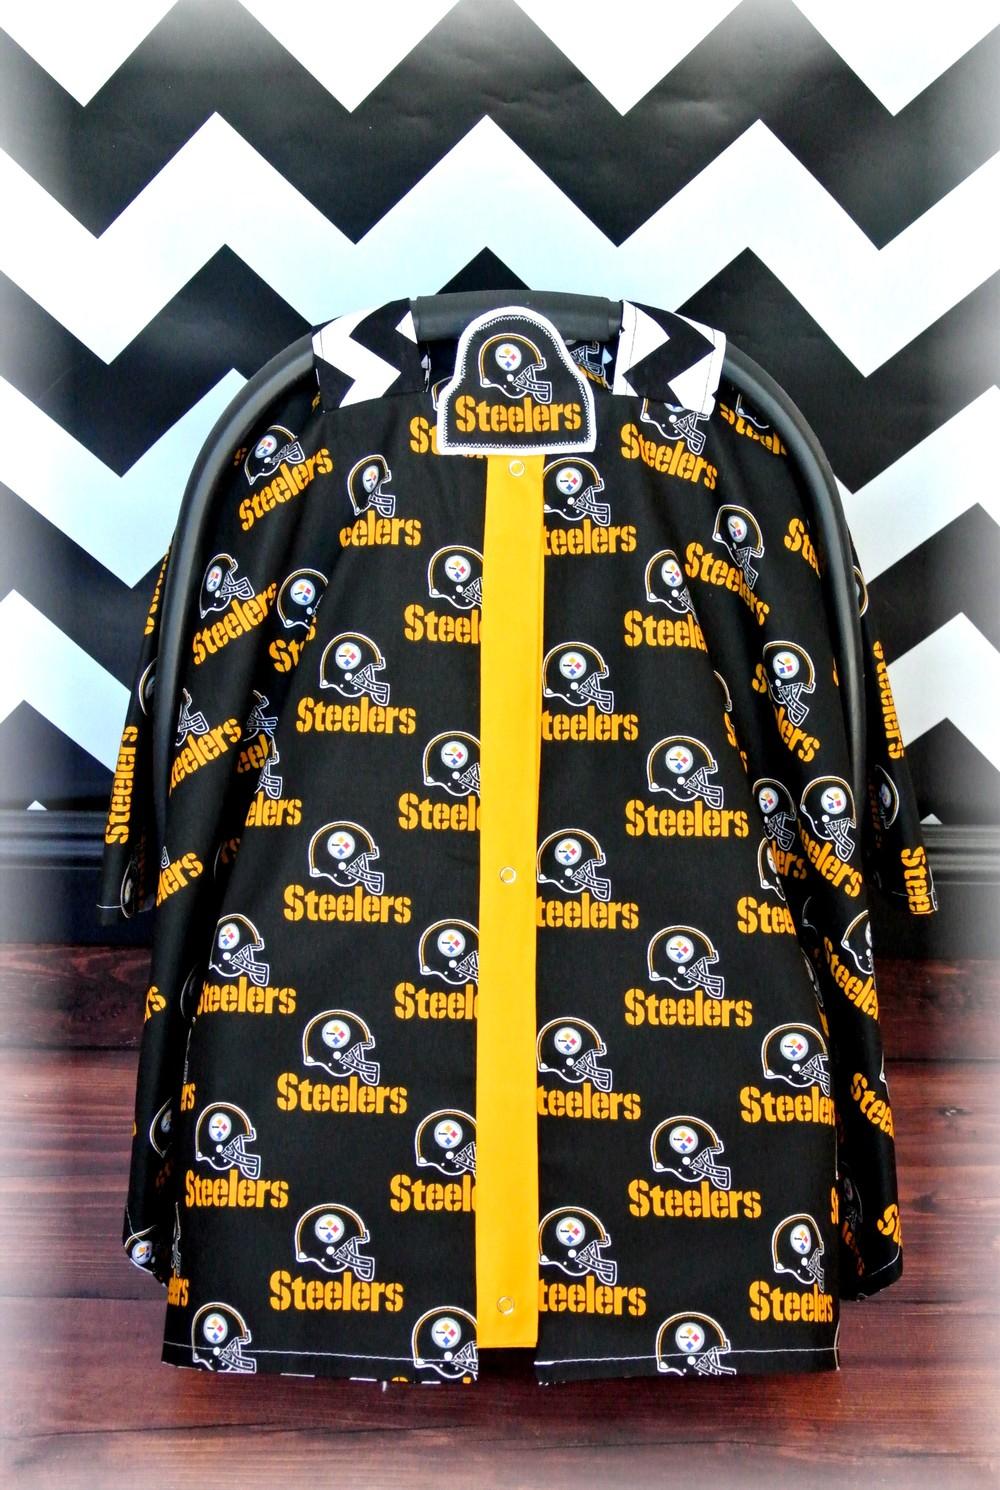 & Pittsburgh Steelers Canopy u2014 JaydenandOlivia